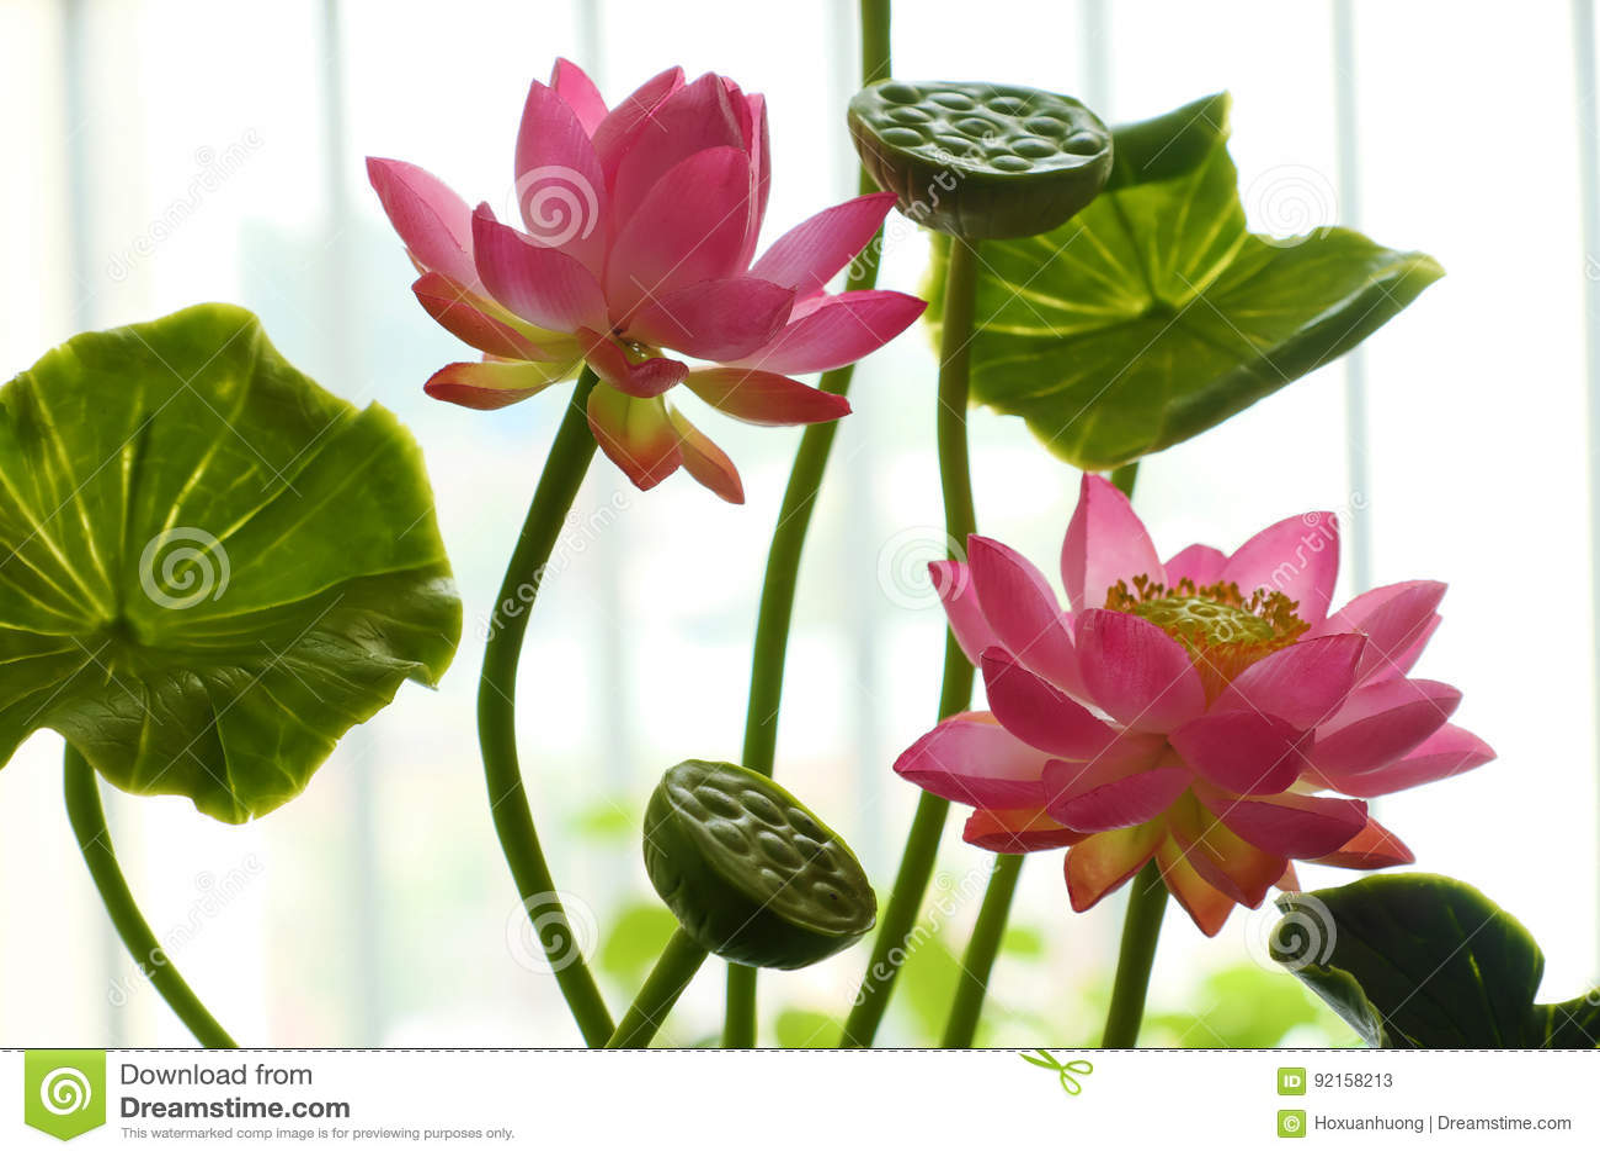 Clay Art Pink Lotus Flower Pot Stock Image Image Of Green Purple